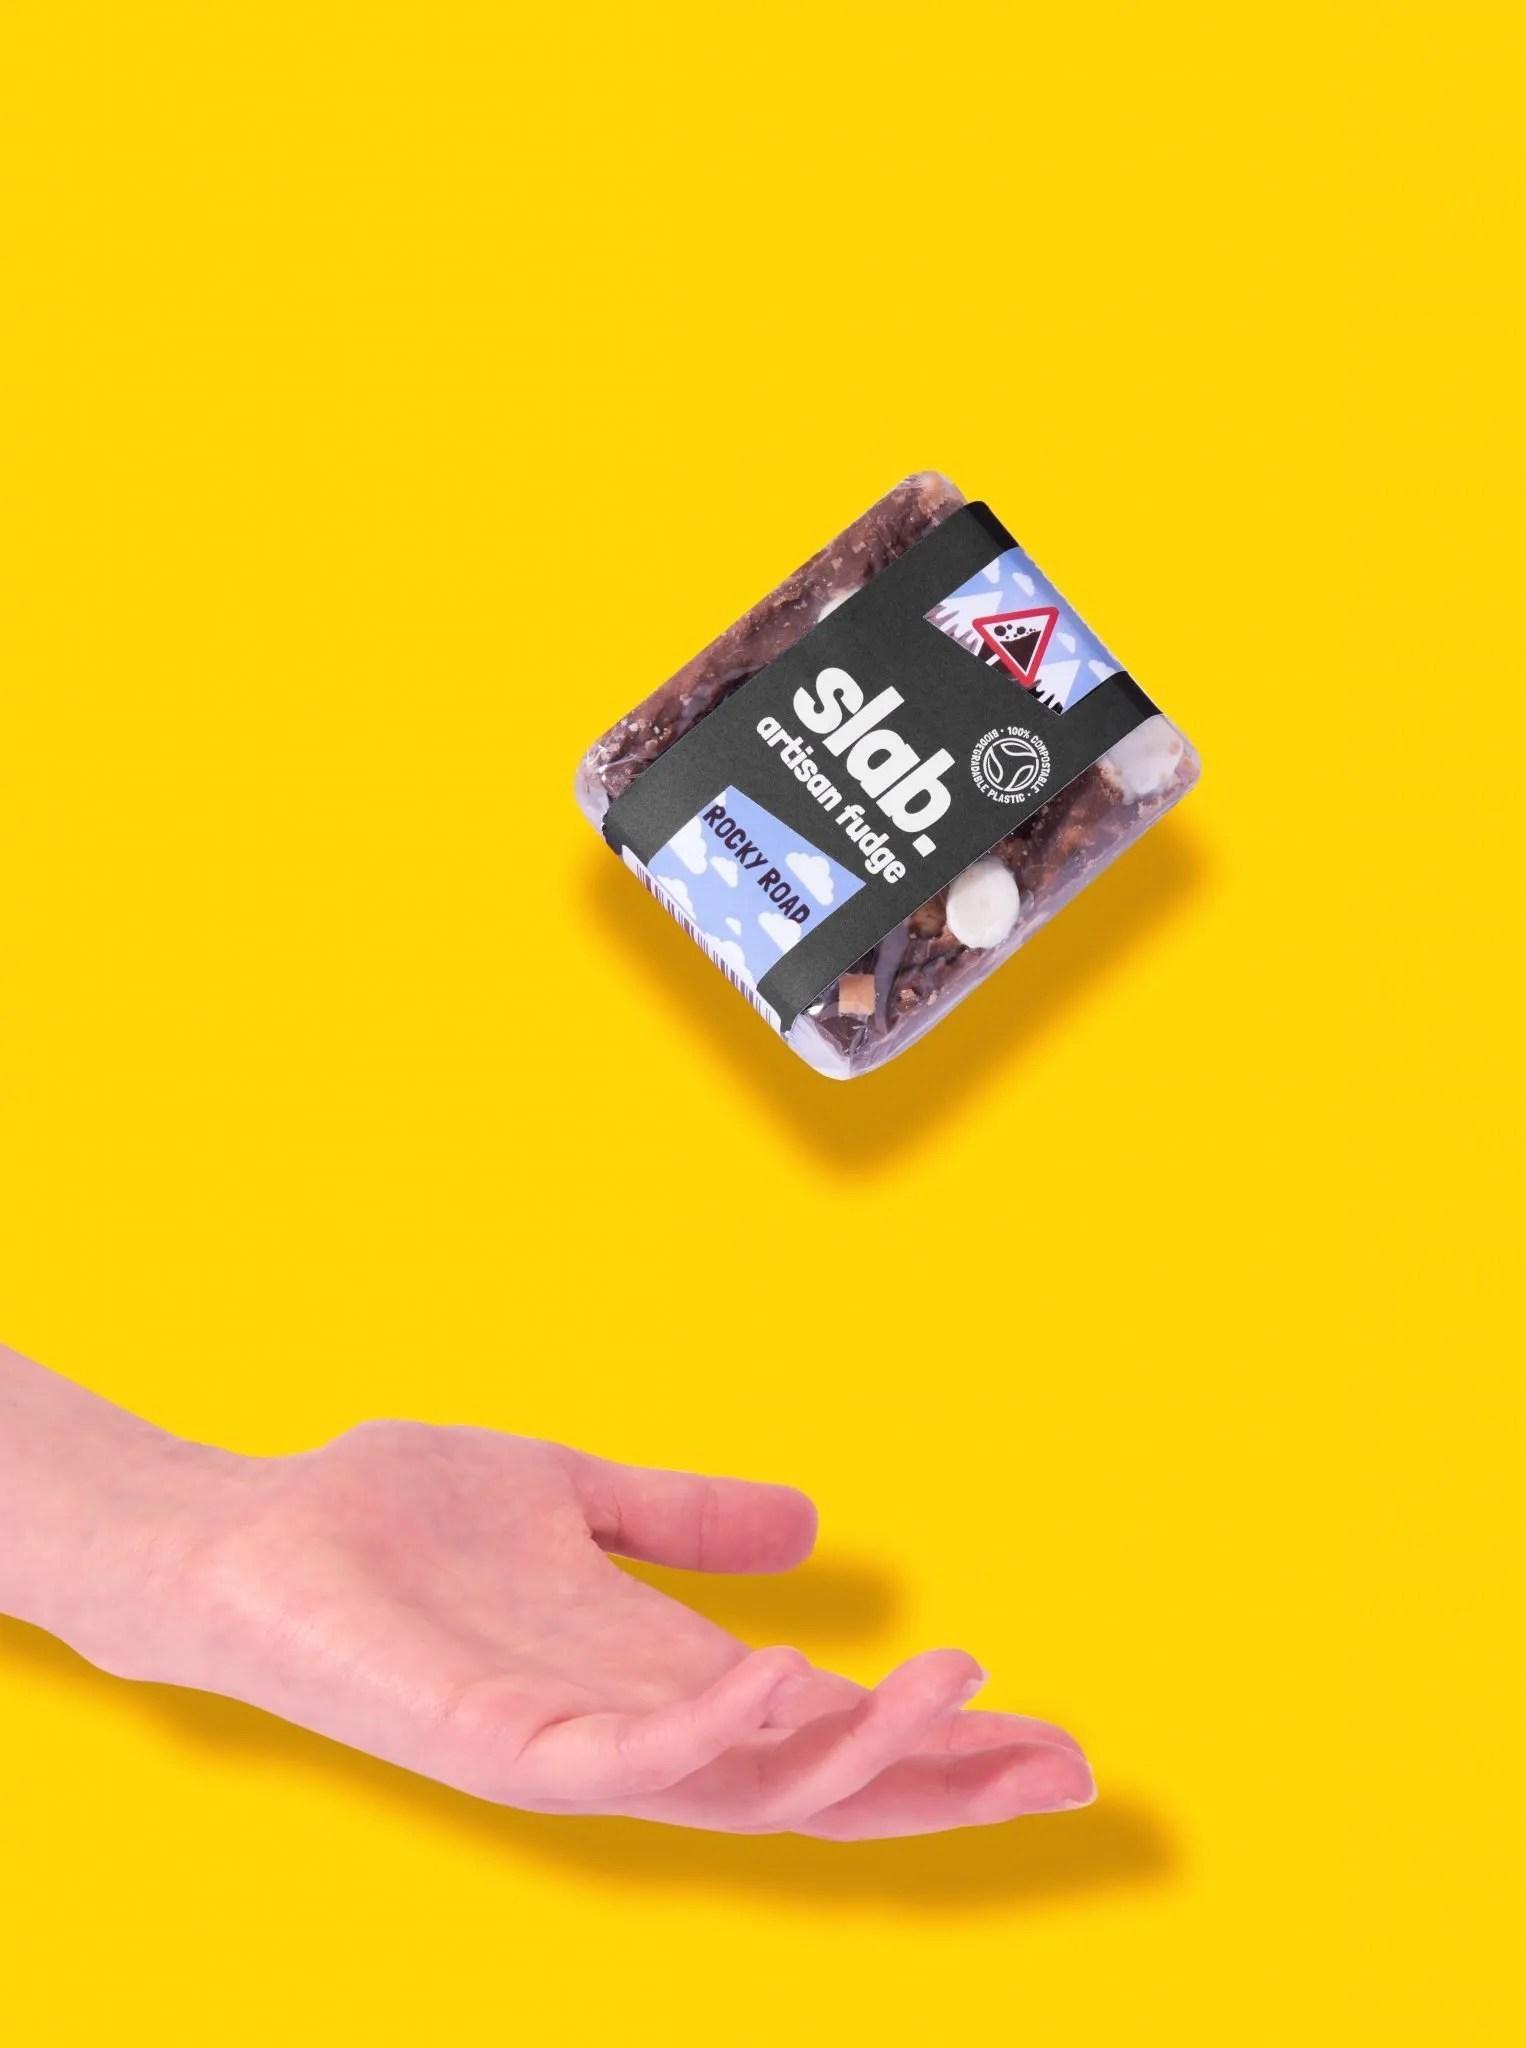 Slab Artisan Fudge Creative Photo - Dairy Hand